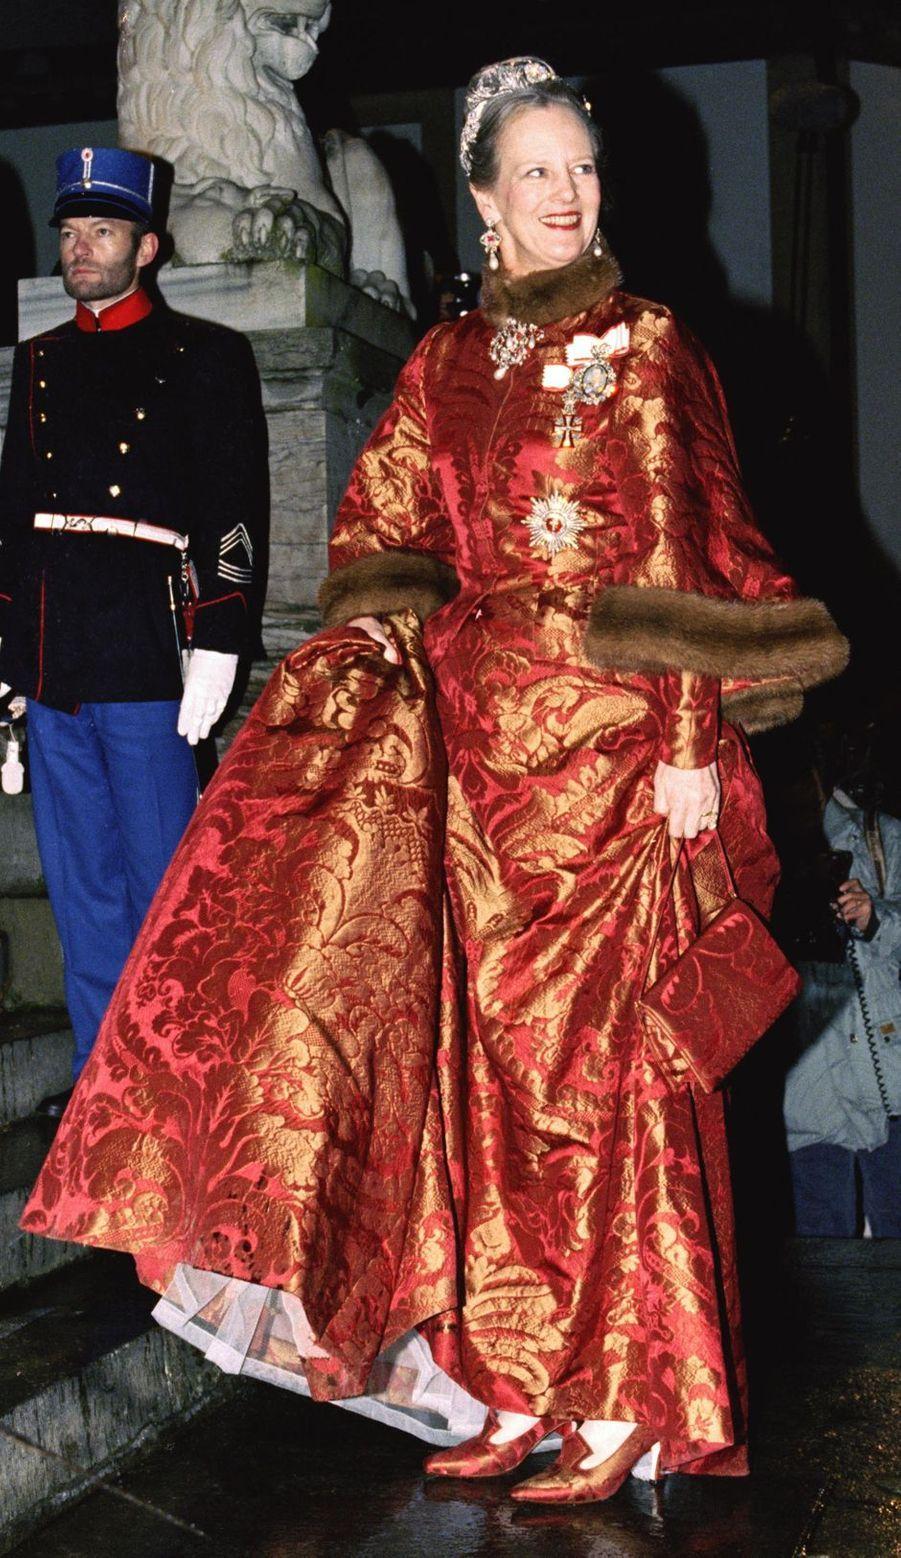 La reine Margrethe II de Danemark à Frederiksborg le 18 novembre 1995